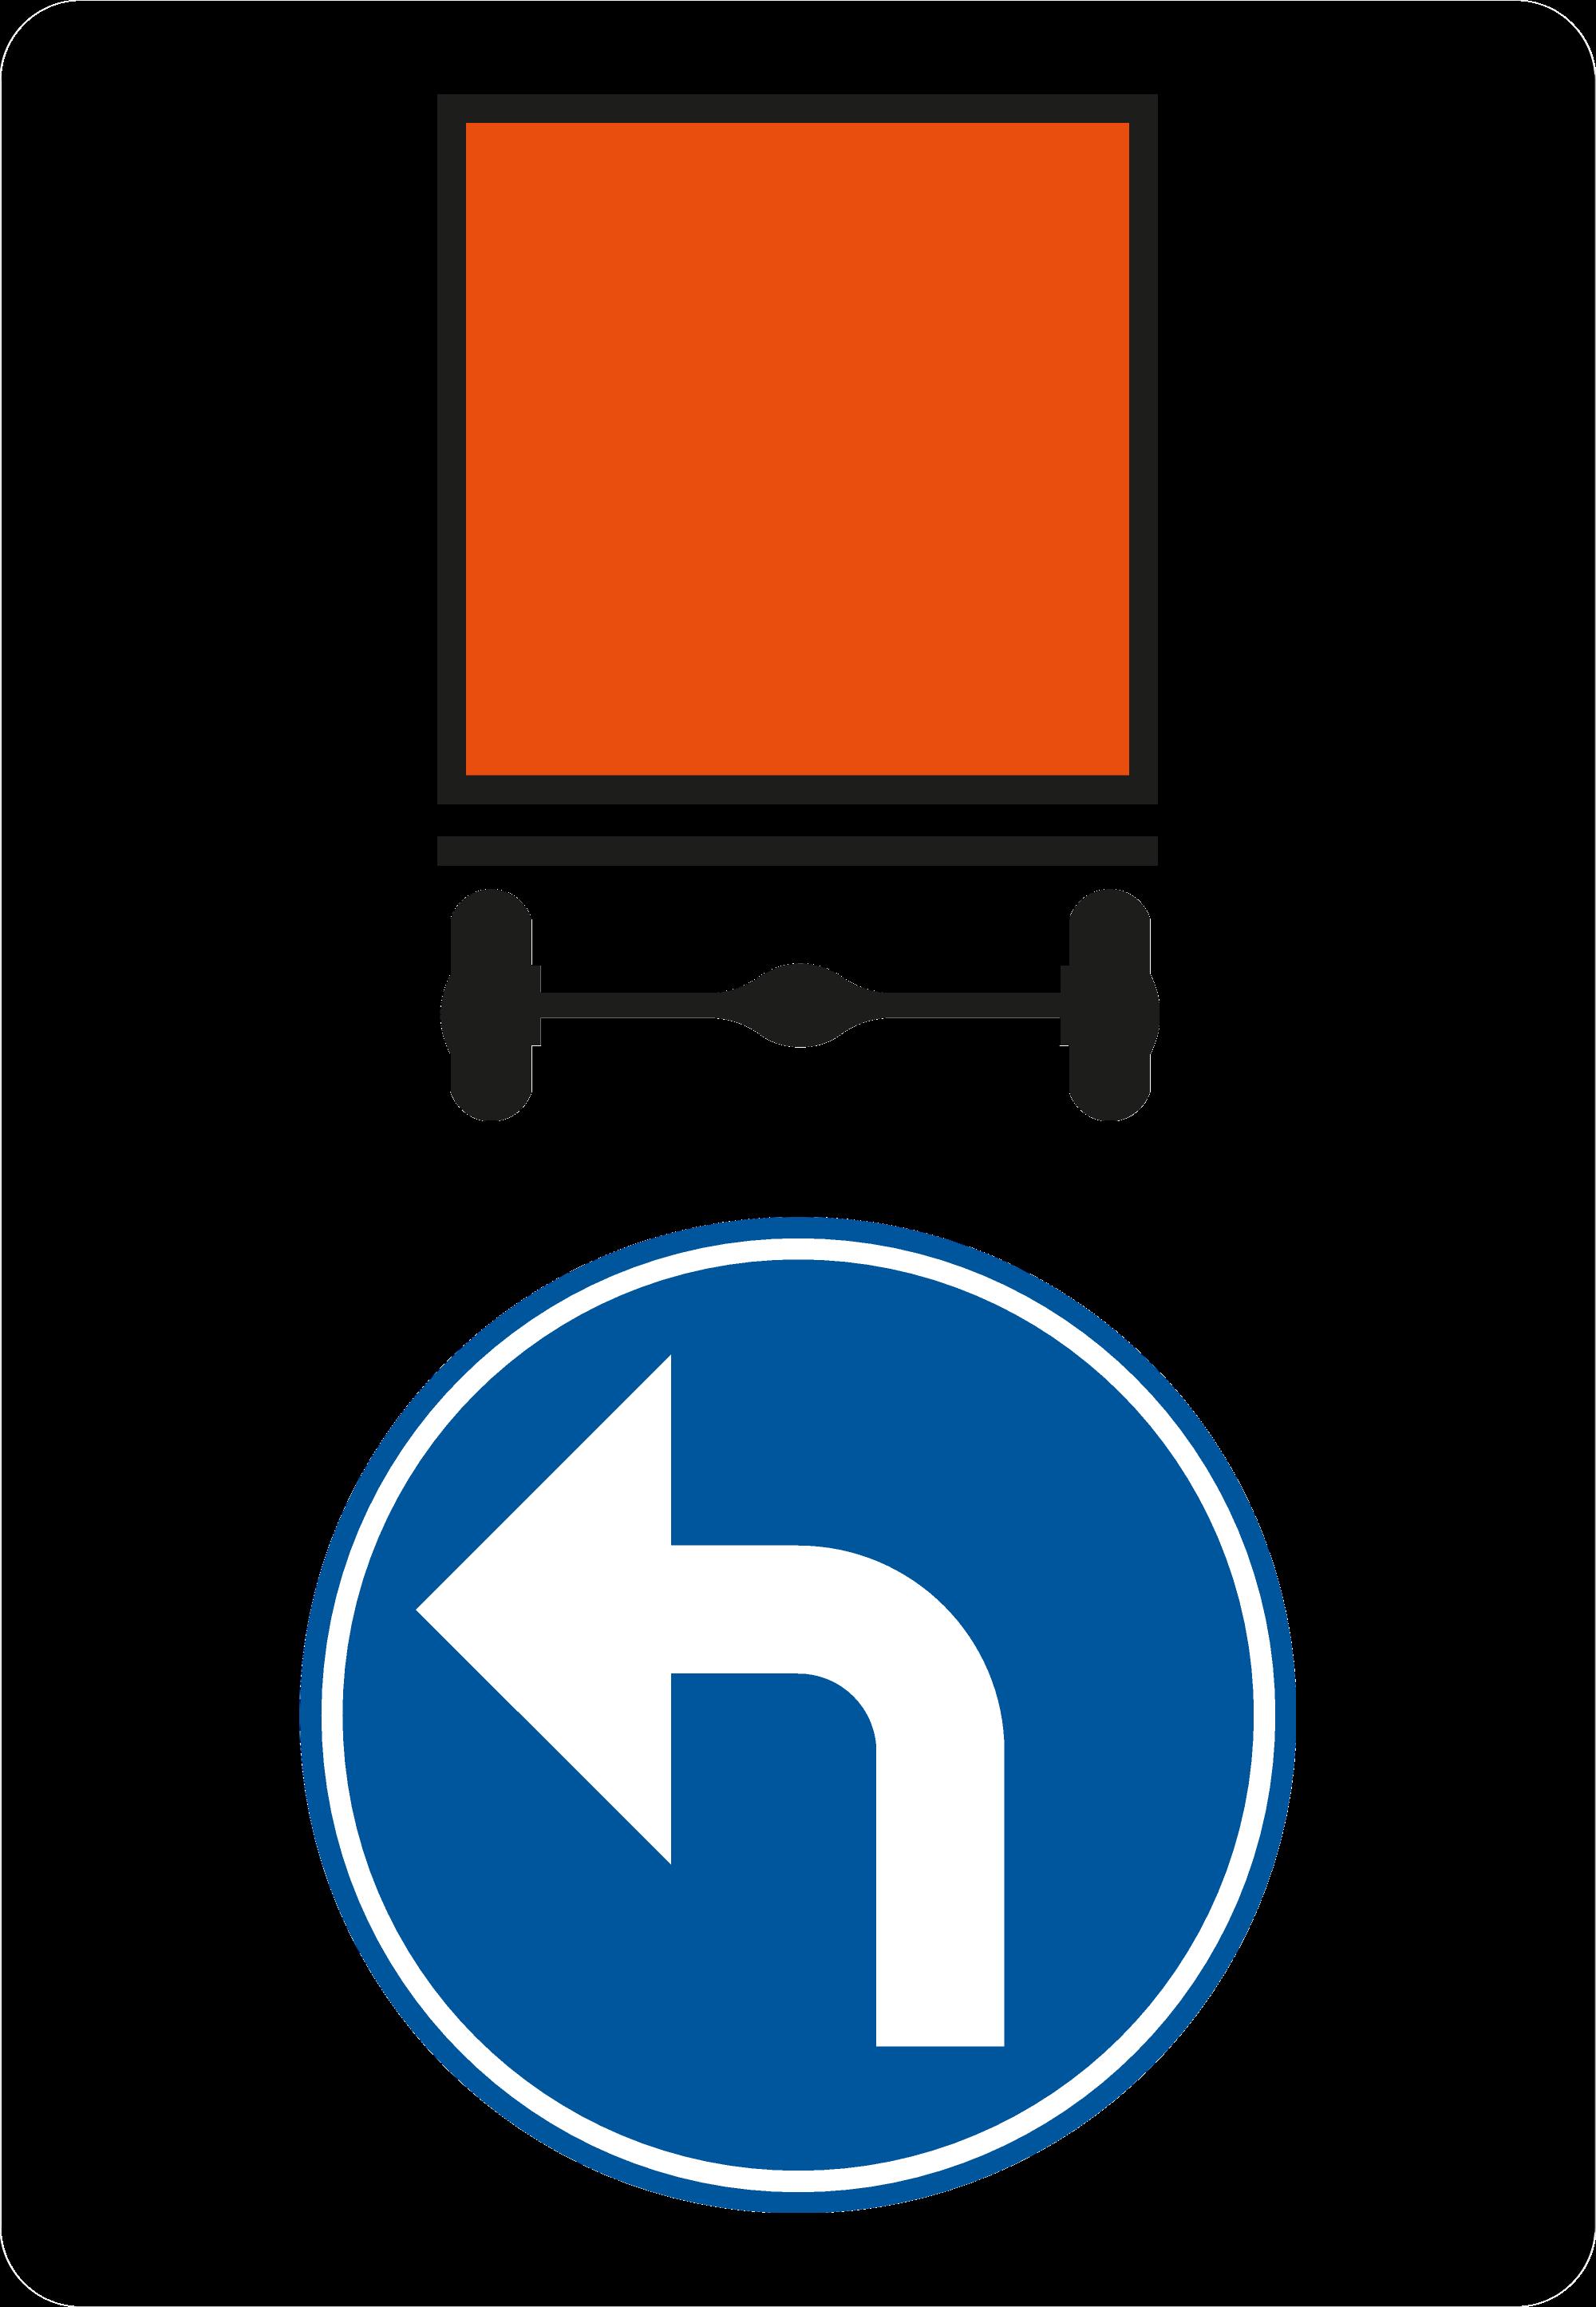 Signface - D4 links - klasse  II - 1250/1750 mm